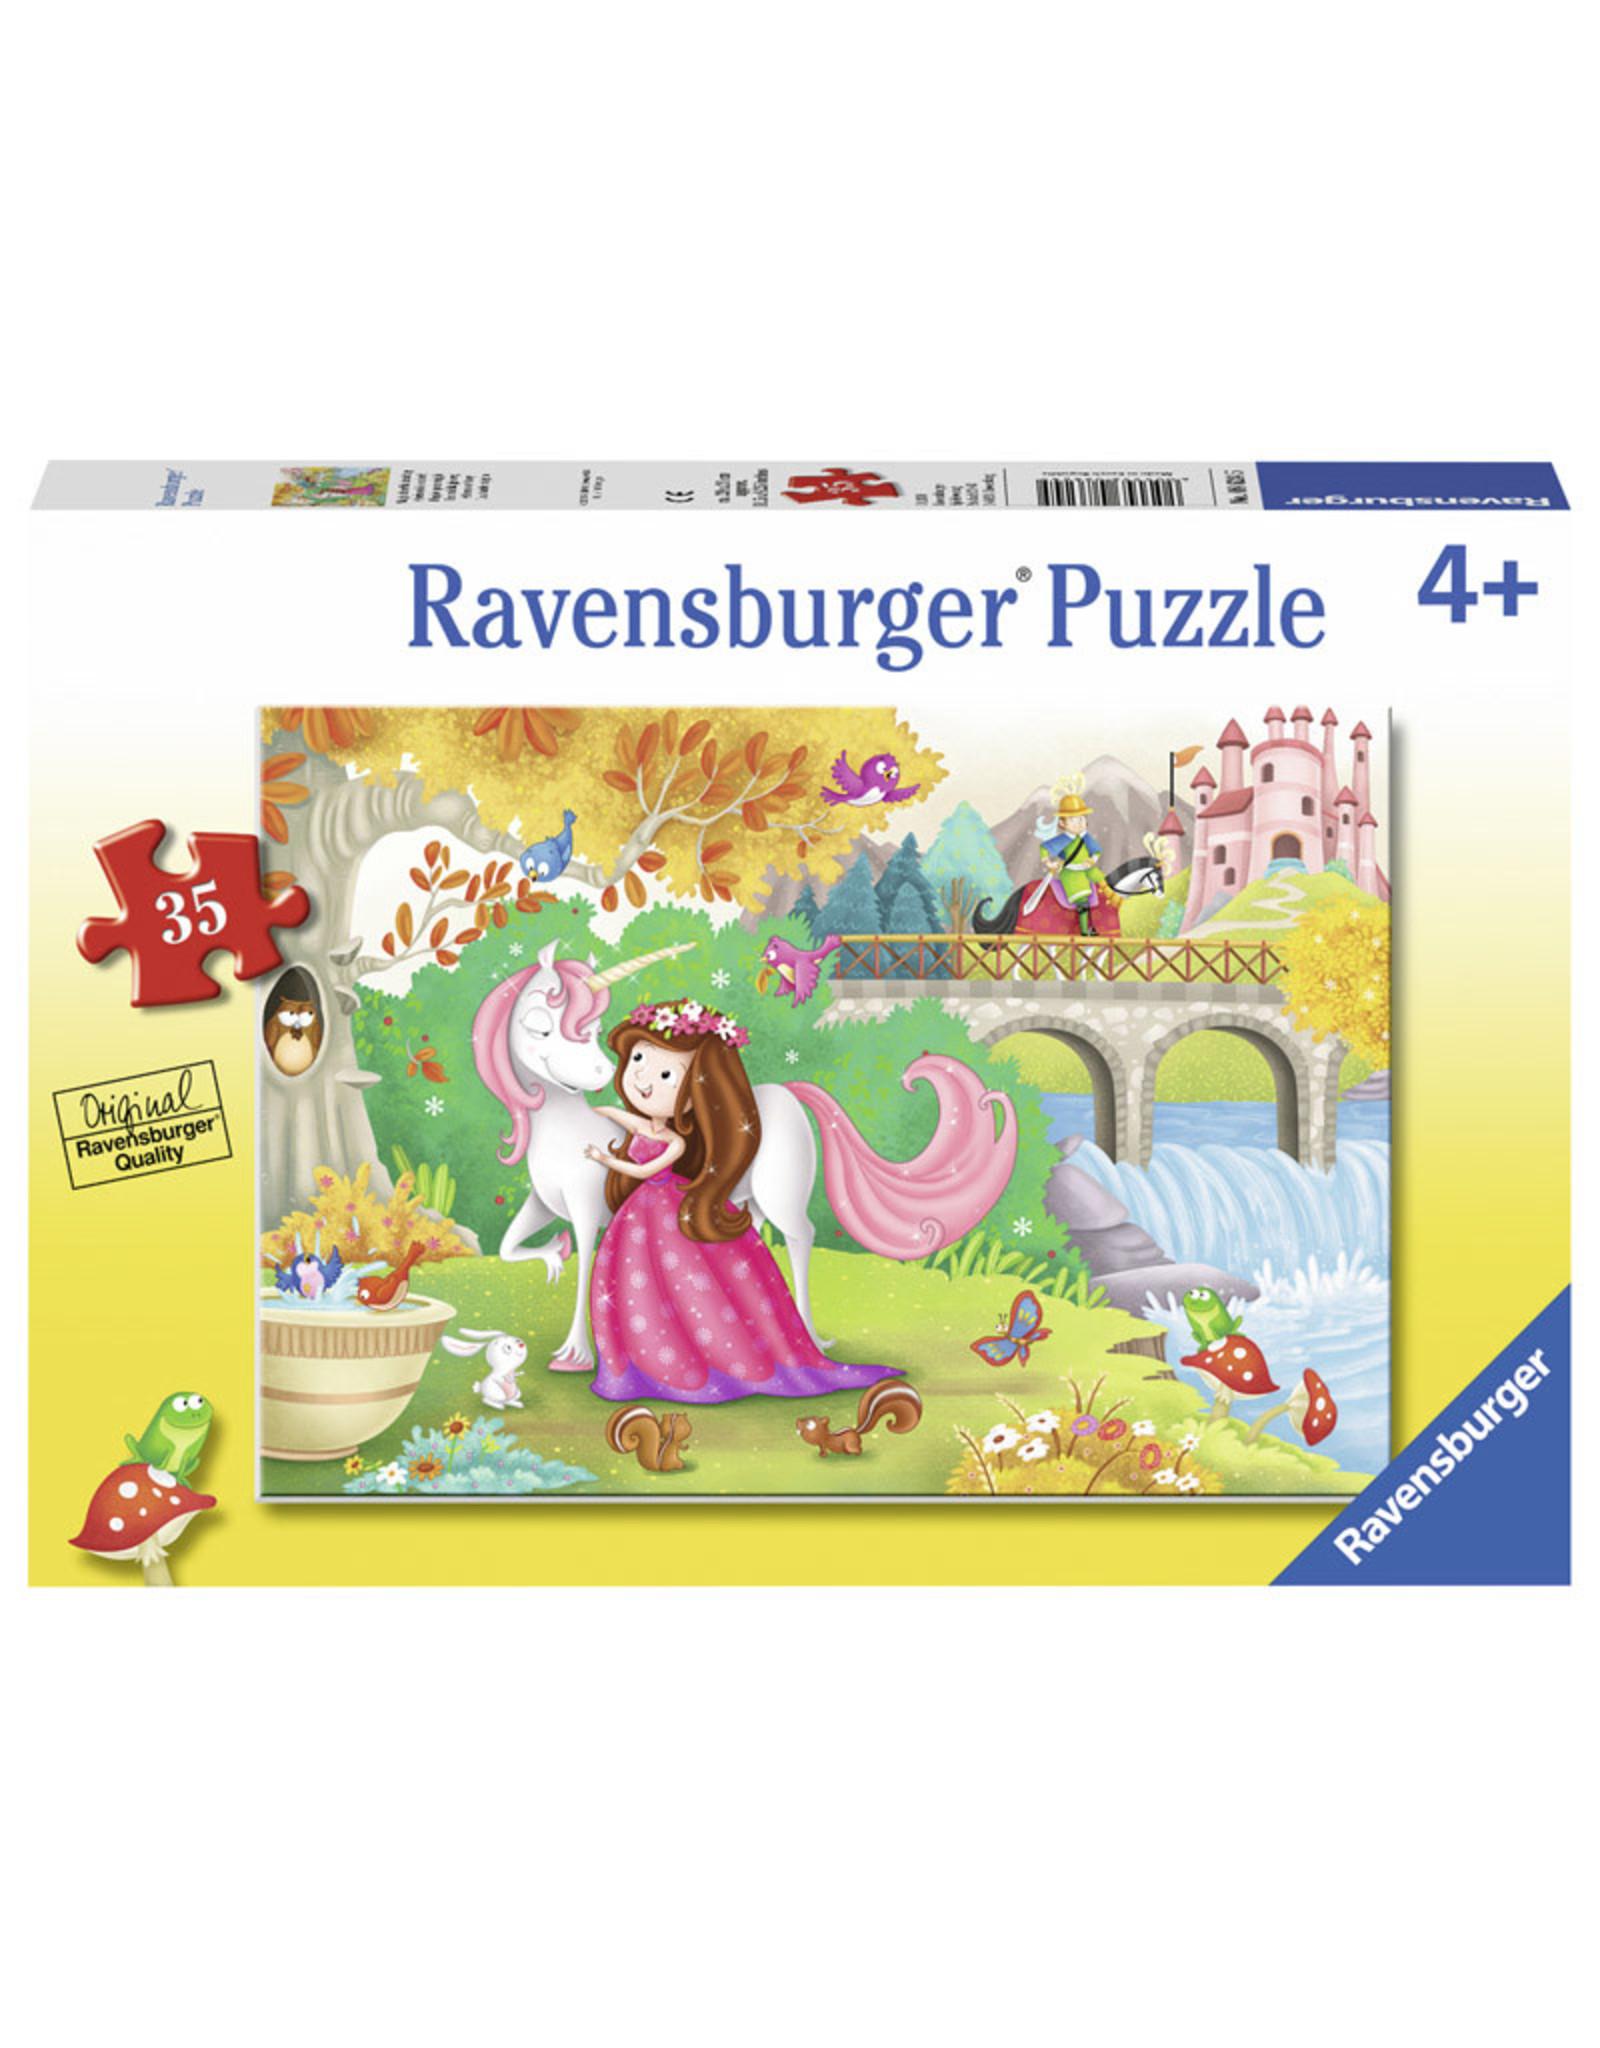 Ravensburger Afternoon Away 35pc